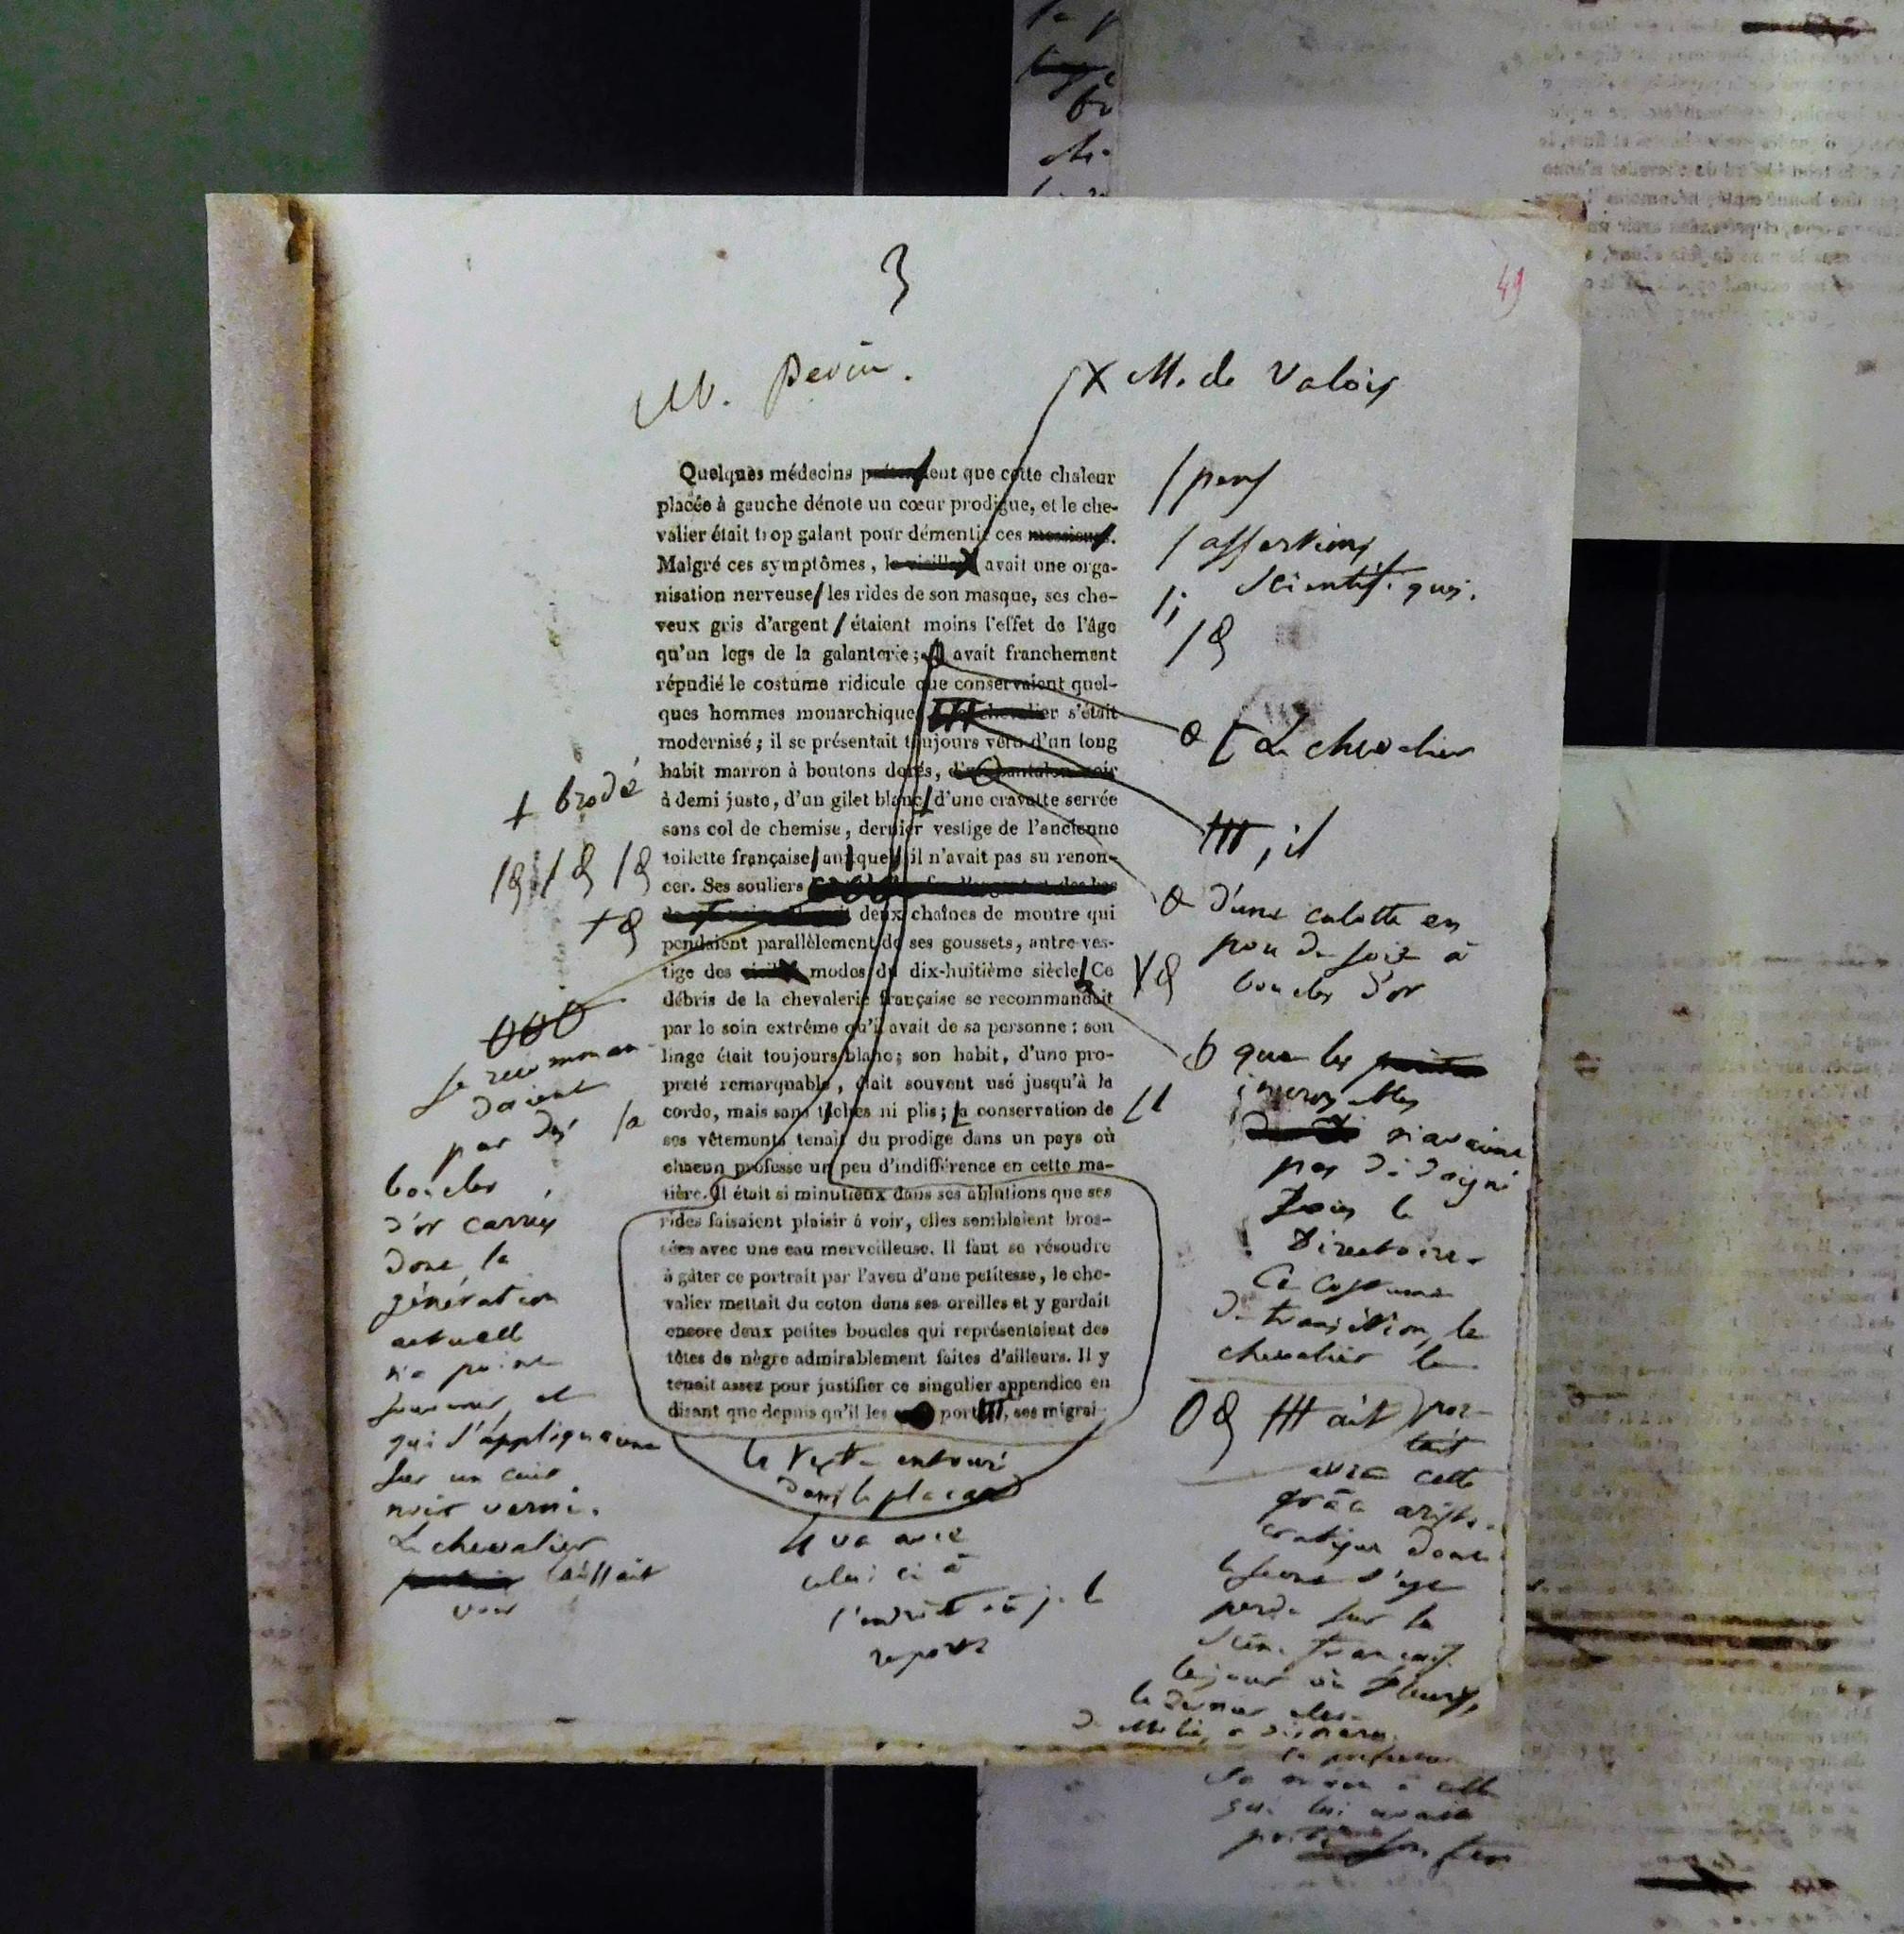 An edited manuscript by Balzac at the Maison Balzac.